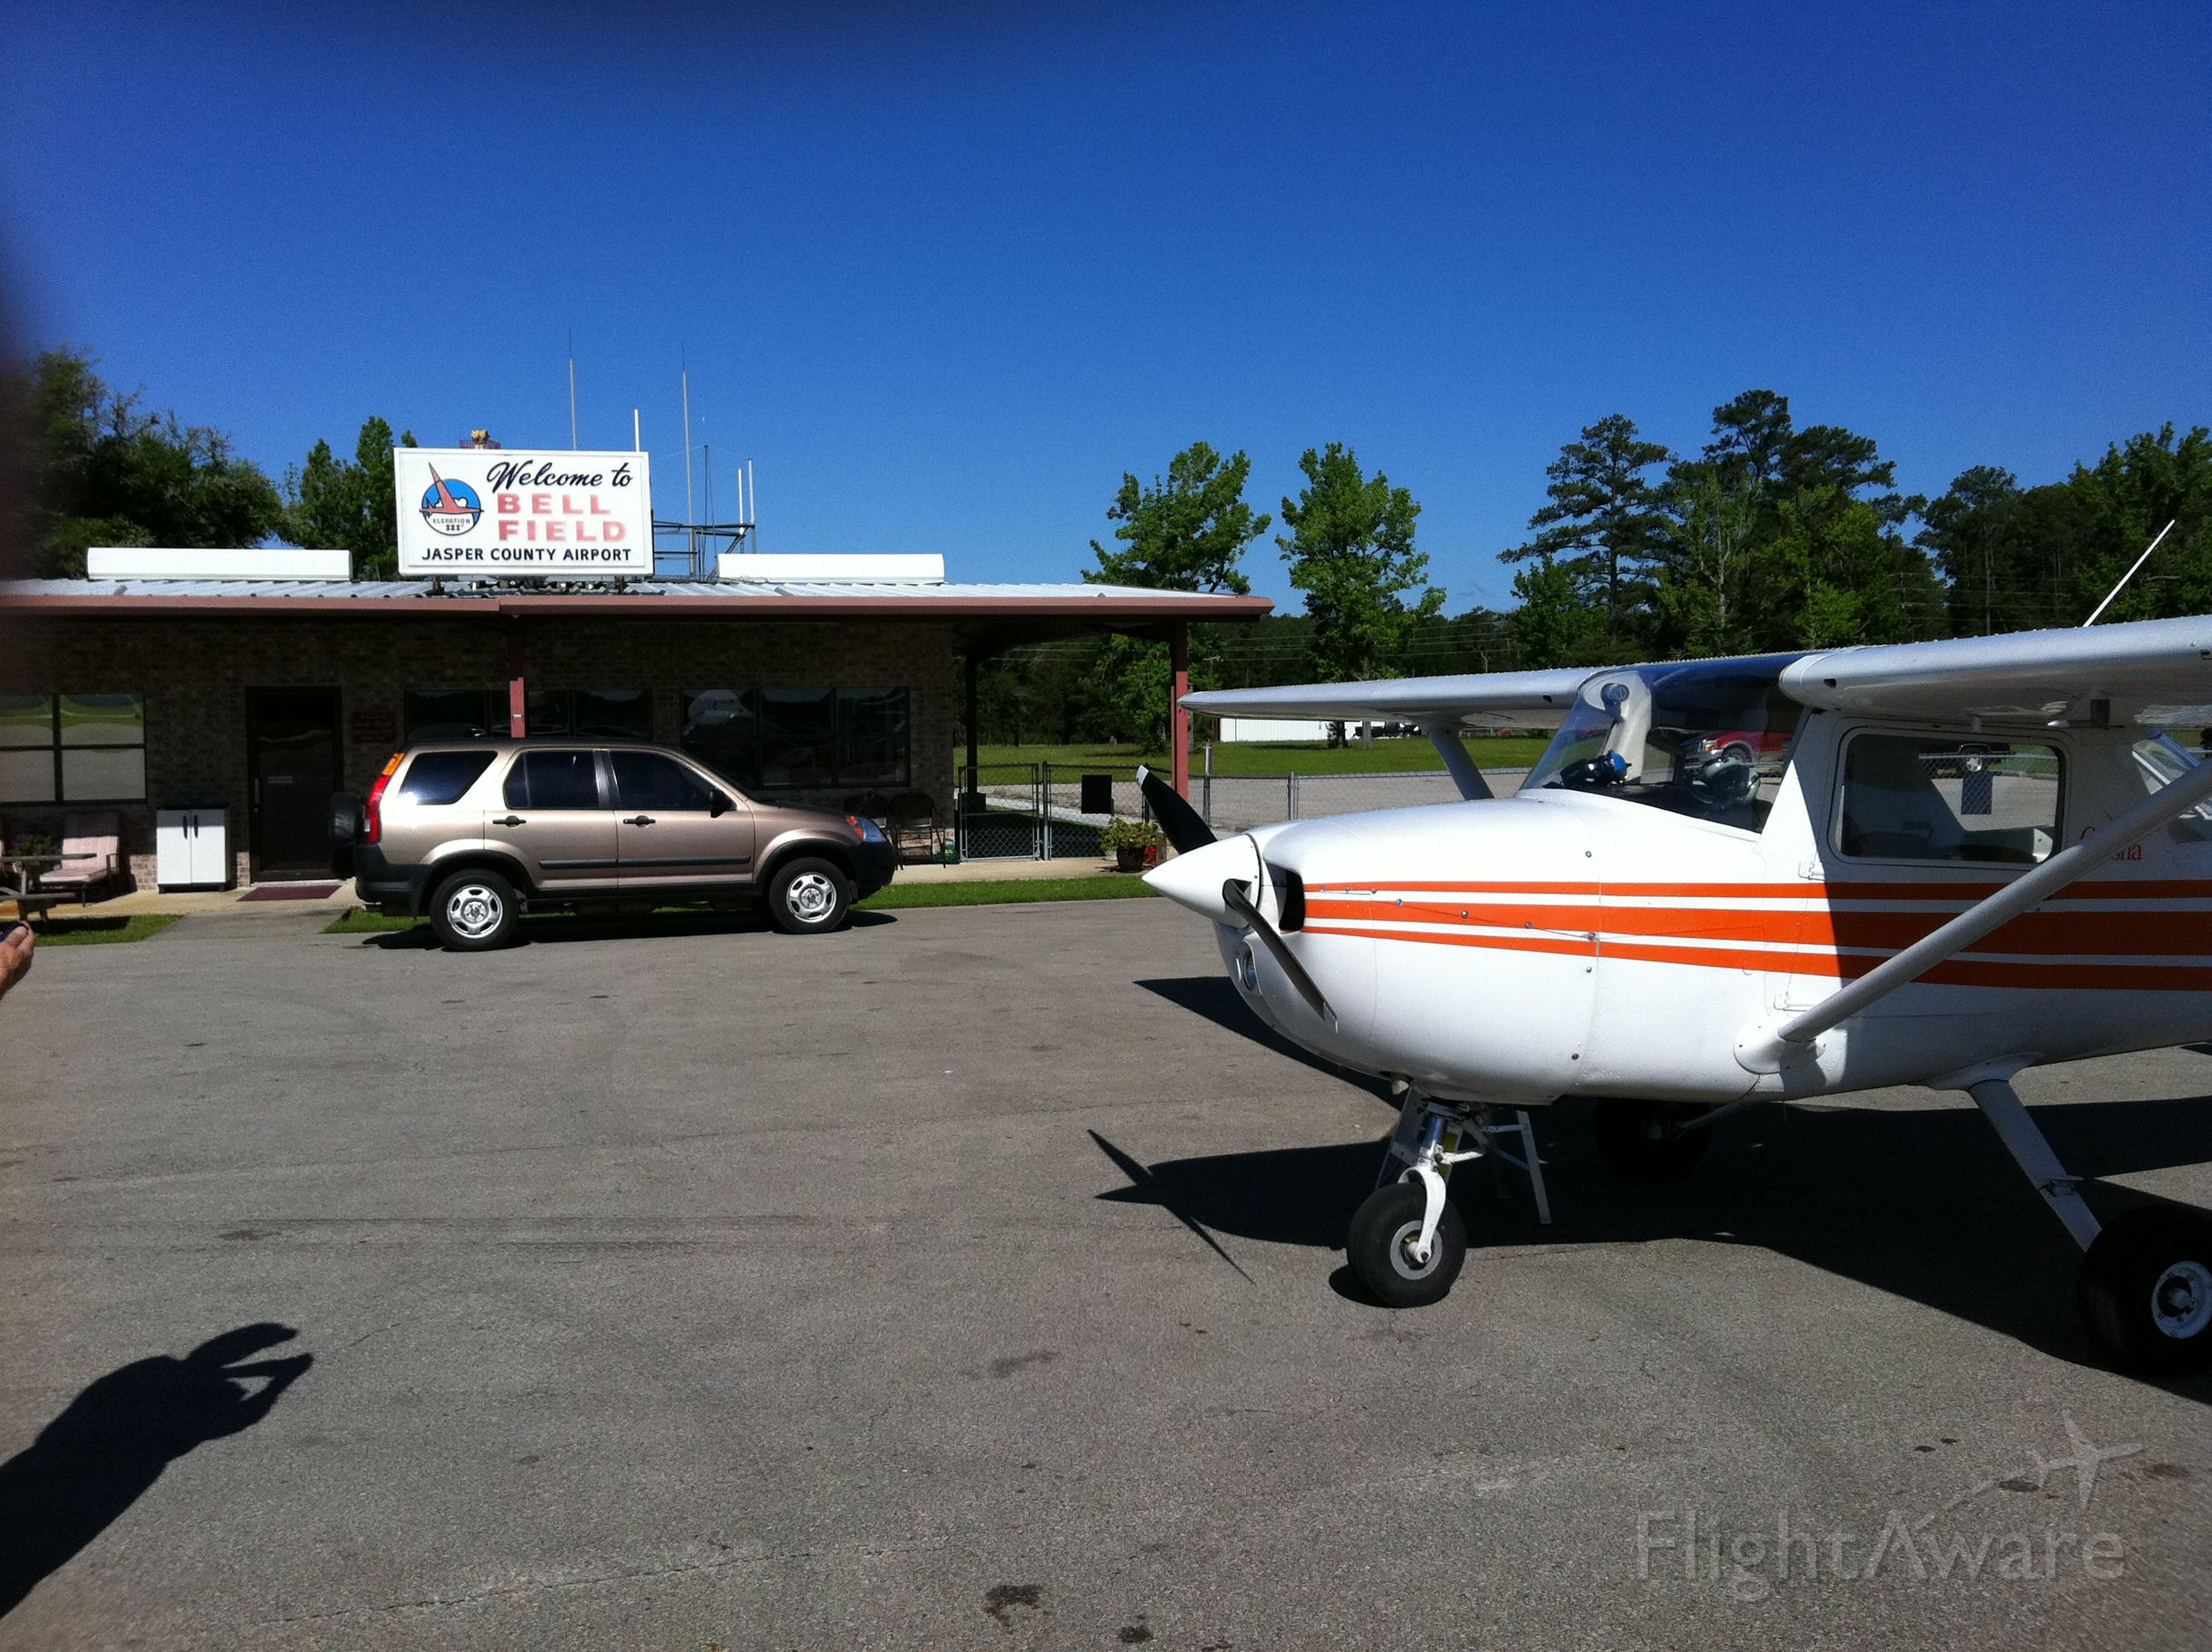 N66790 — - Fuel stop in Jasper Tx